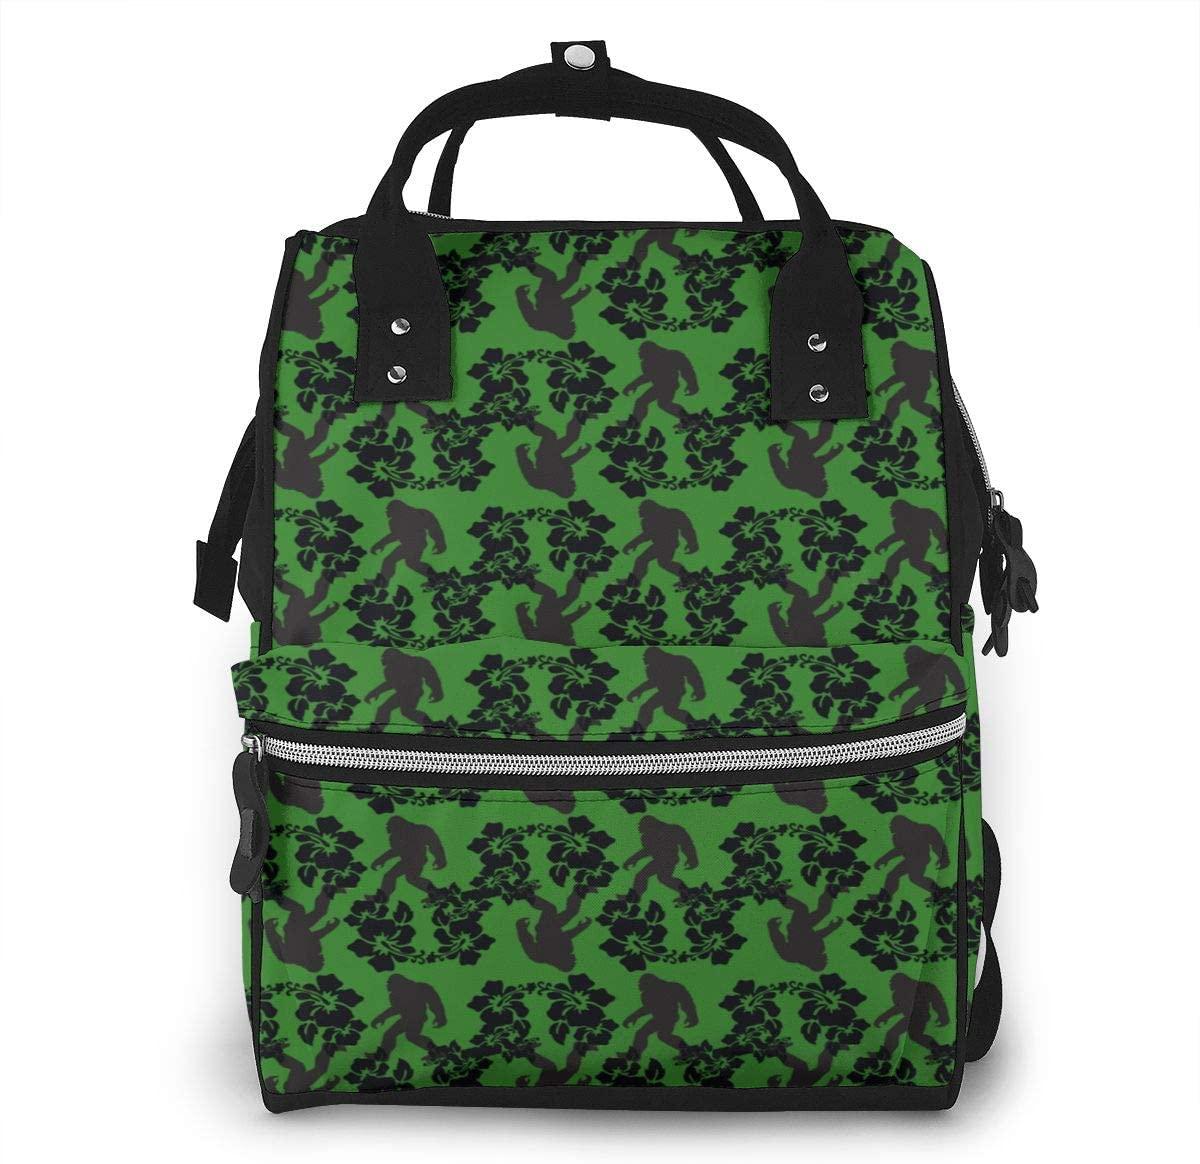 NiYoung Diaper Bag,Stylish Waterproof Baby Bag Backpack,Multi-Function Travel Backpack Maternity Nappy Bag (Hawaii Flowers)